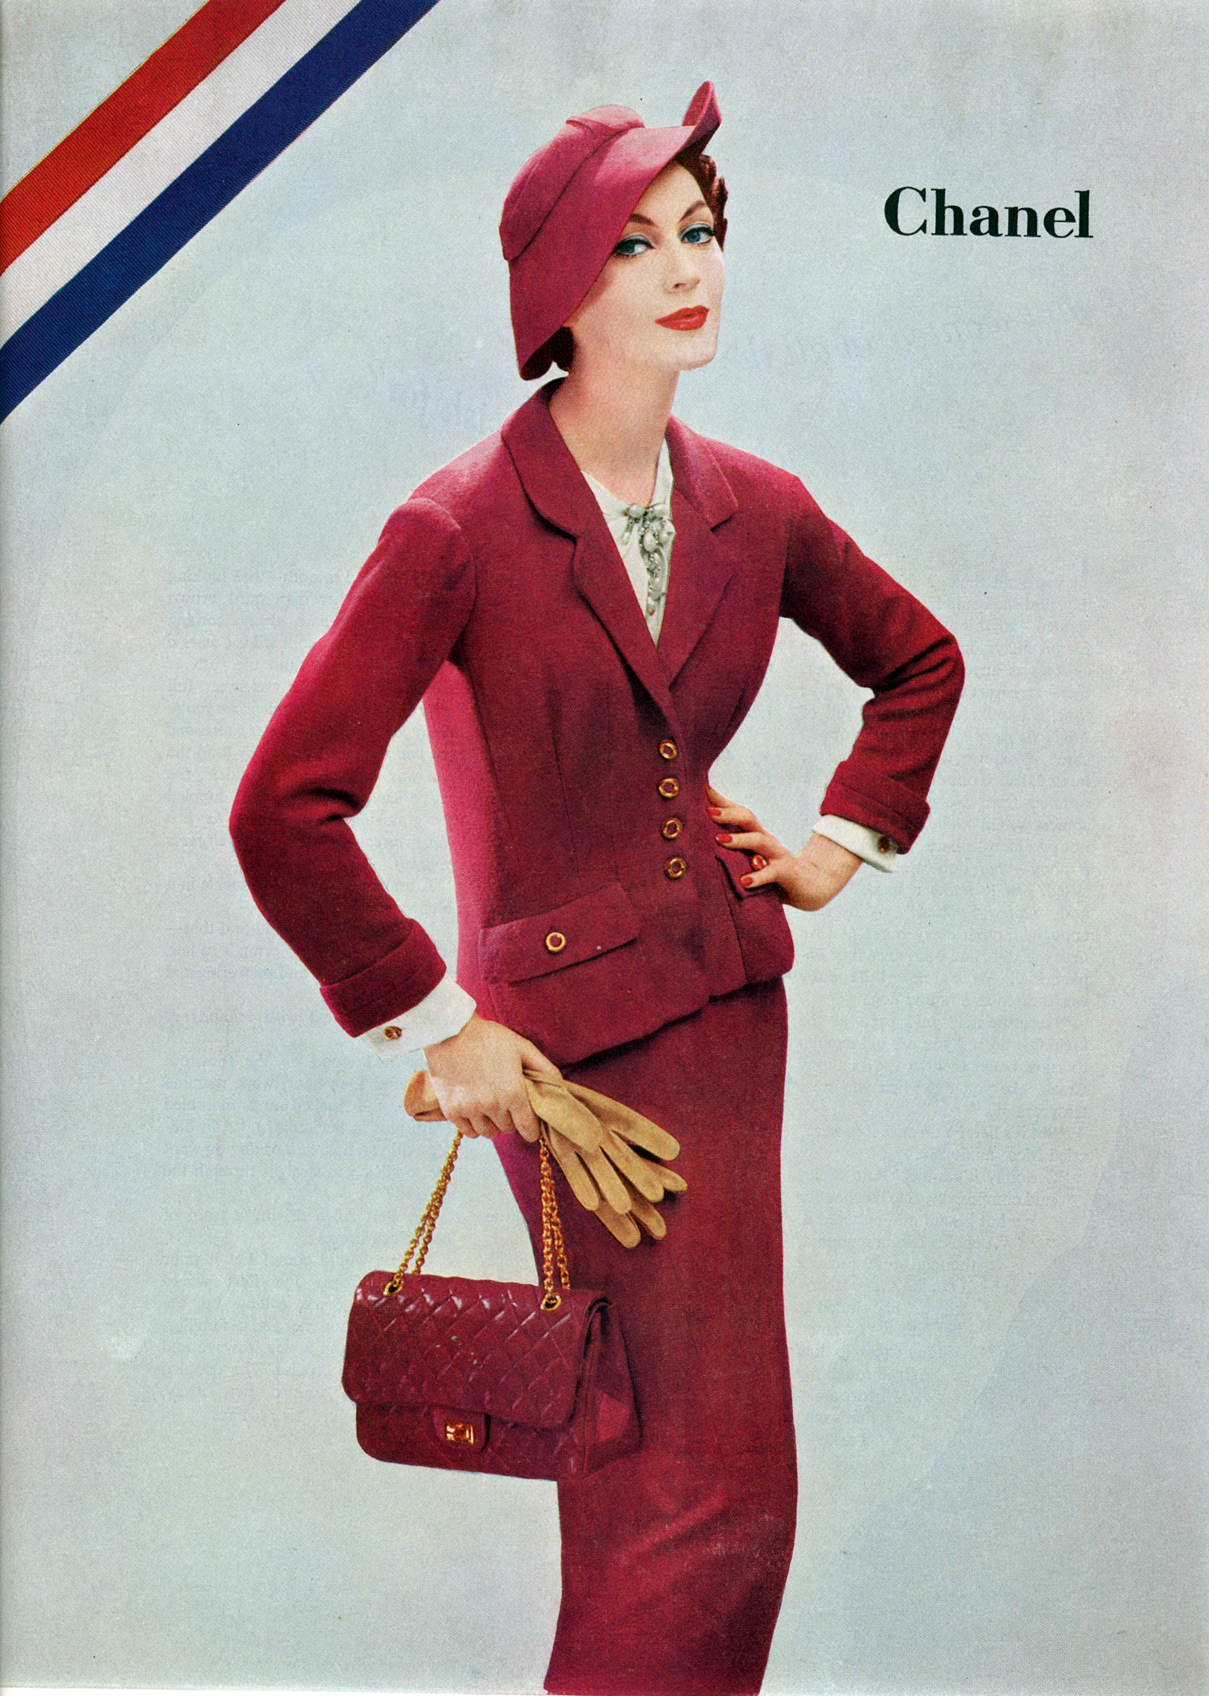 Chanel Fashion Show Archive